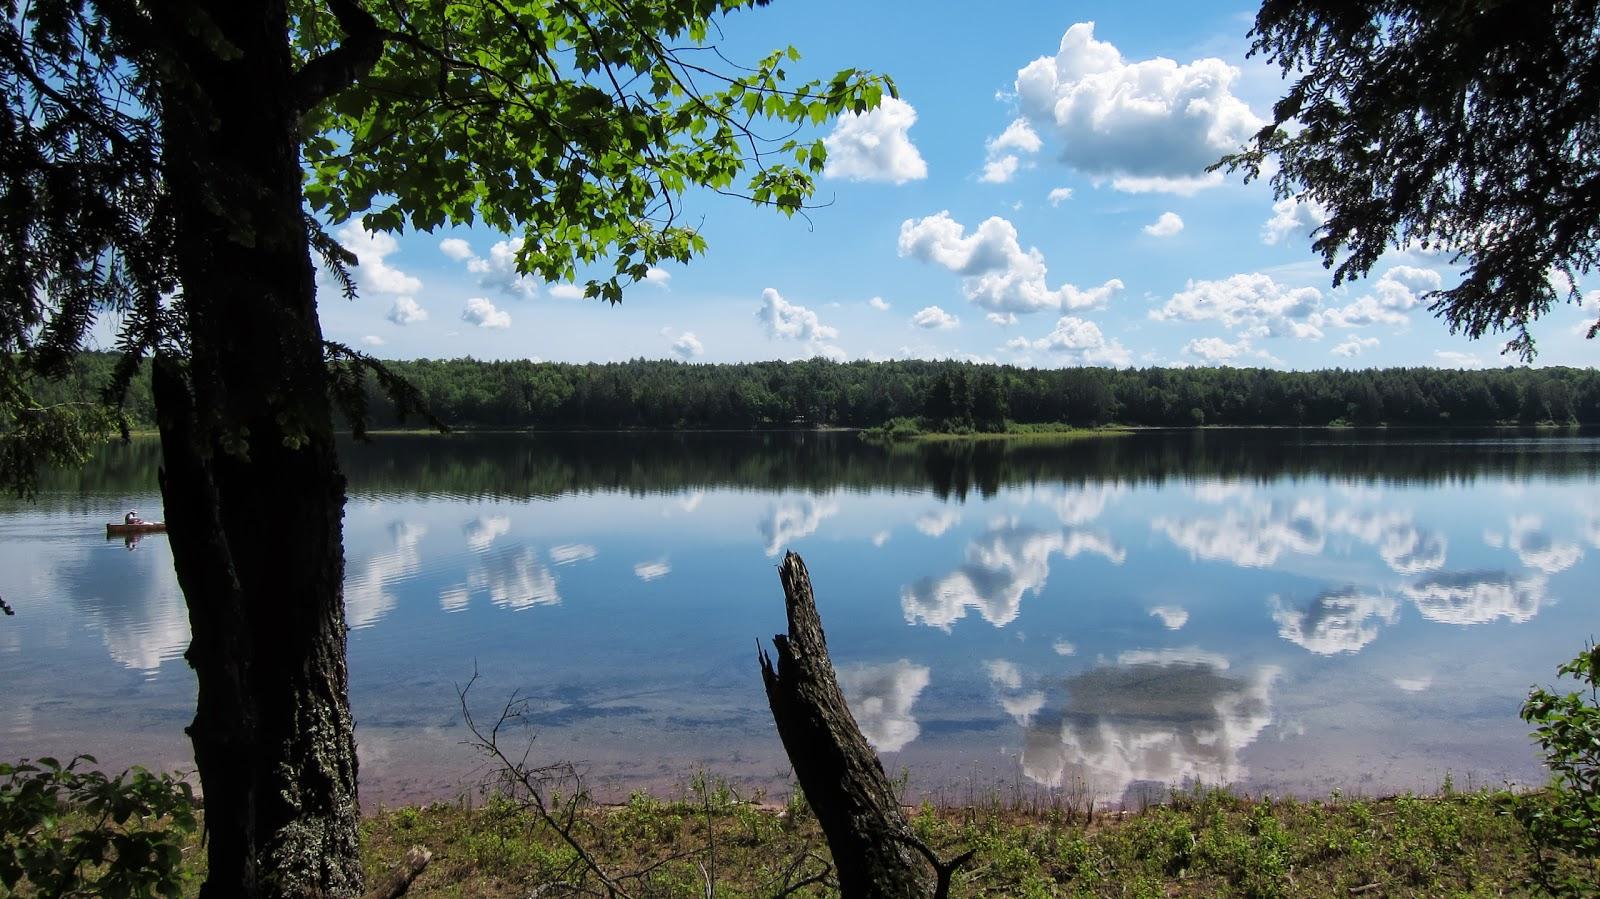 Rambling Hemlock The Sylvania Wilderness Of Michigan